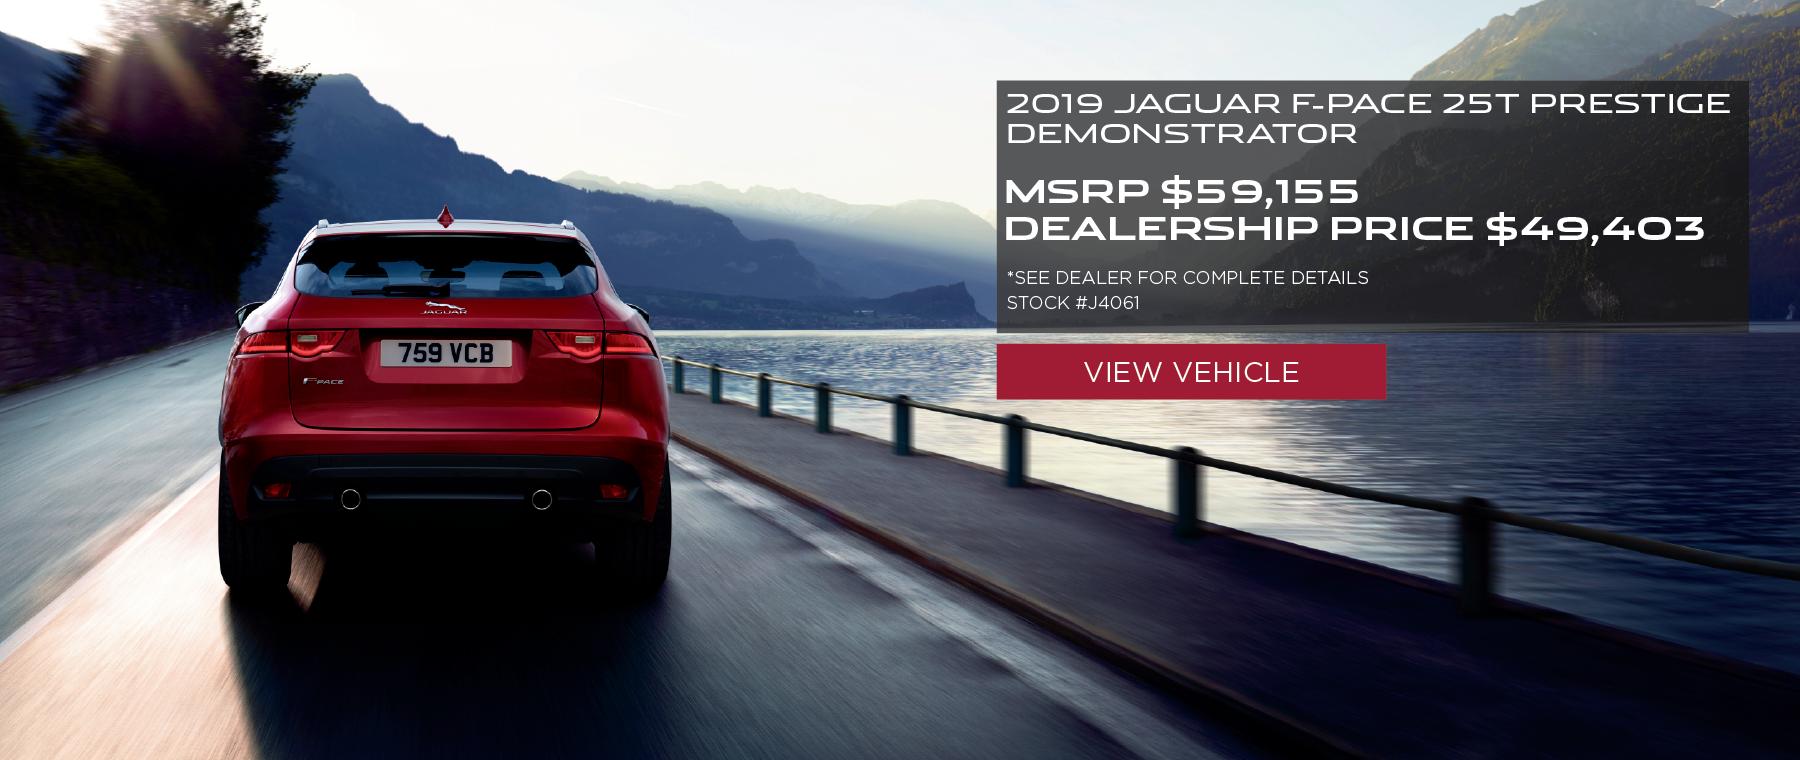 Red 2019 Jaguar F-PACE 25t Prestige Stock on bridge. MSRP $59,155 Dealership Price $49,403 Stock # J4061 . Click to view vehicle. See dealer for complete details.